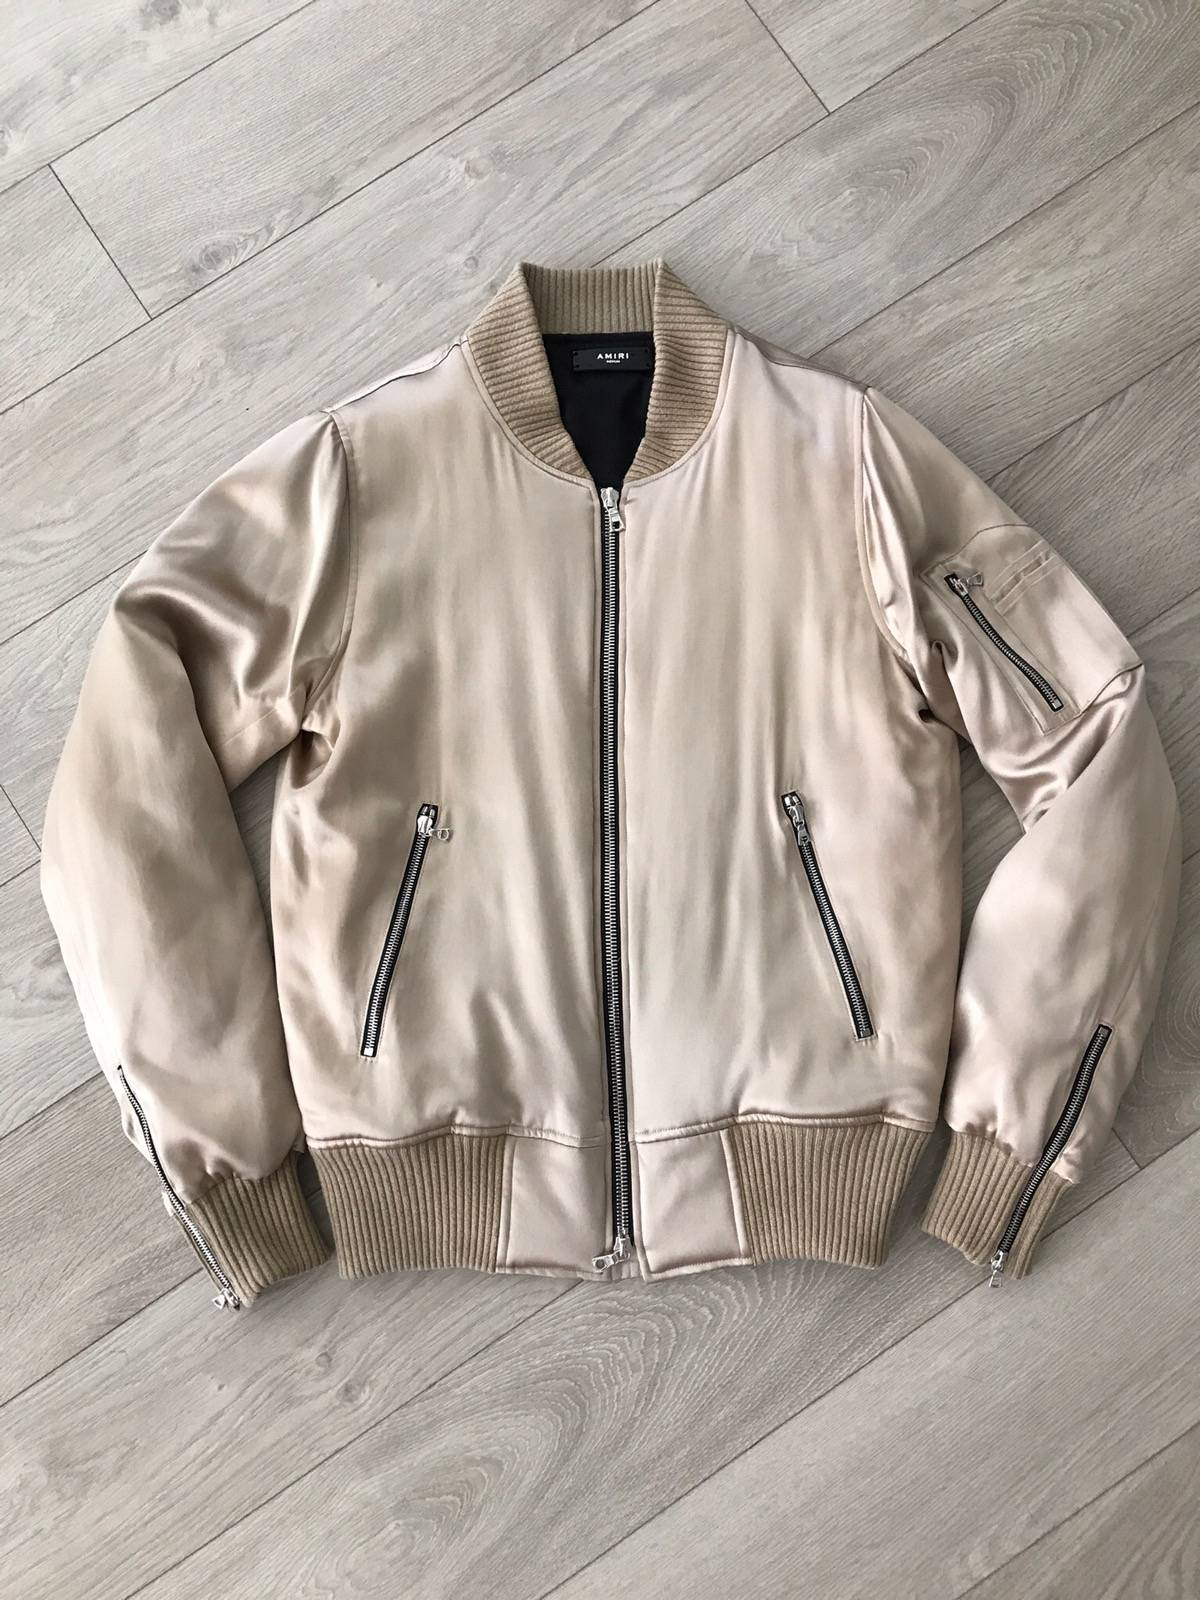 49c5165ba Amiri Silk Bomber Jacket Desert Size M $850